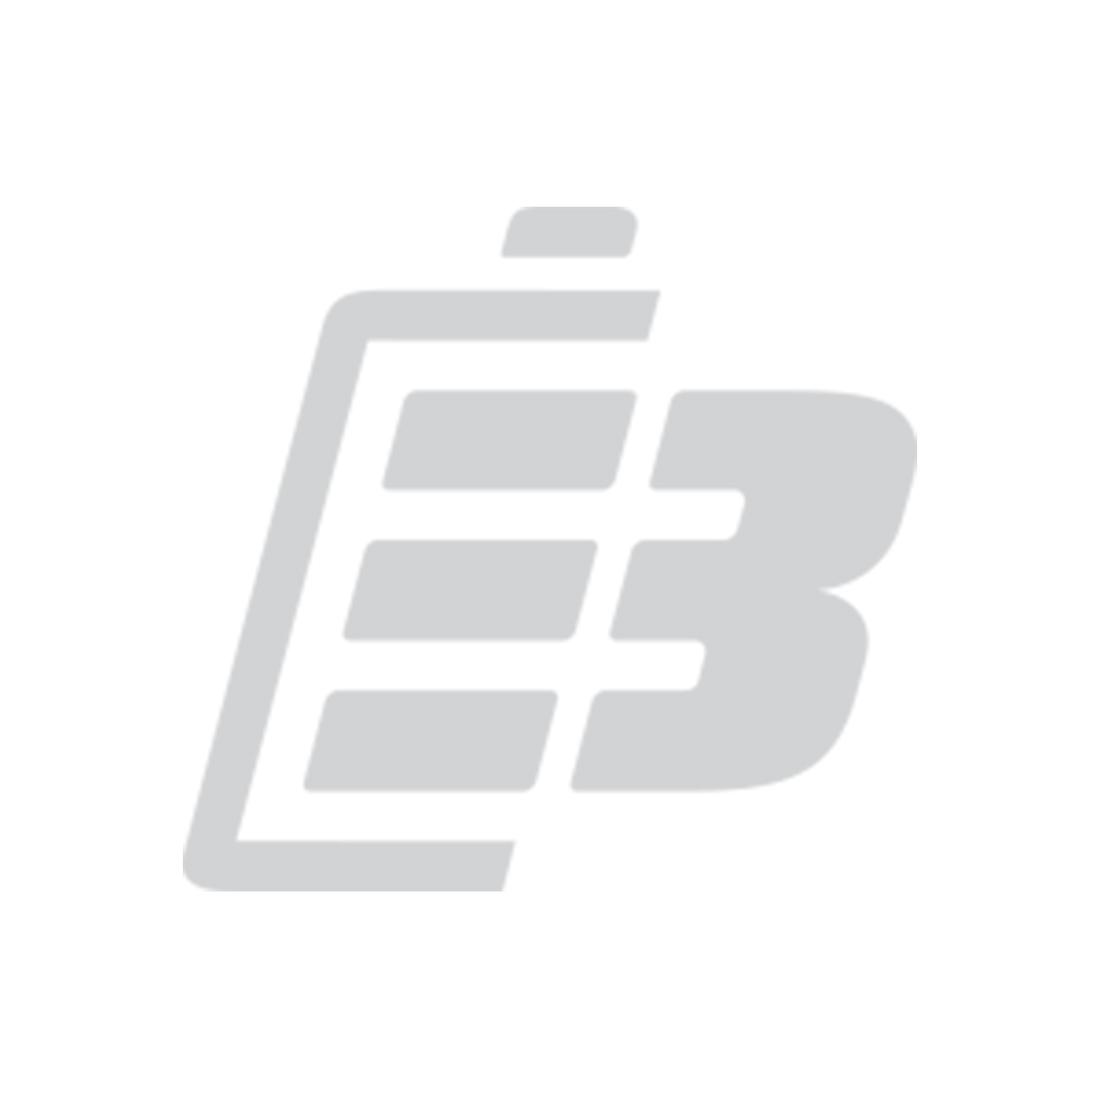 Smartphone battery Huawei P8 Lite_1